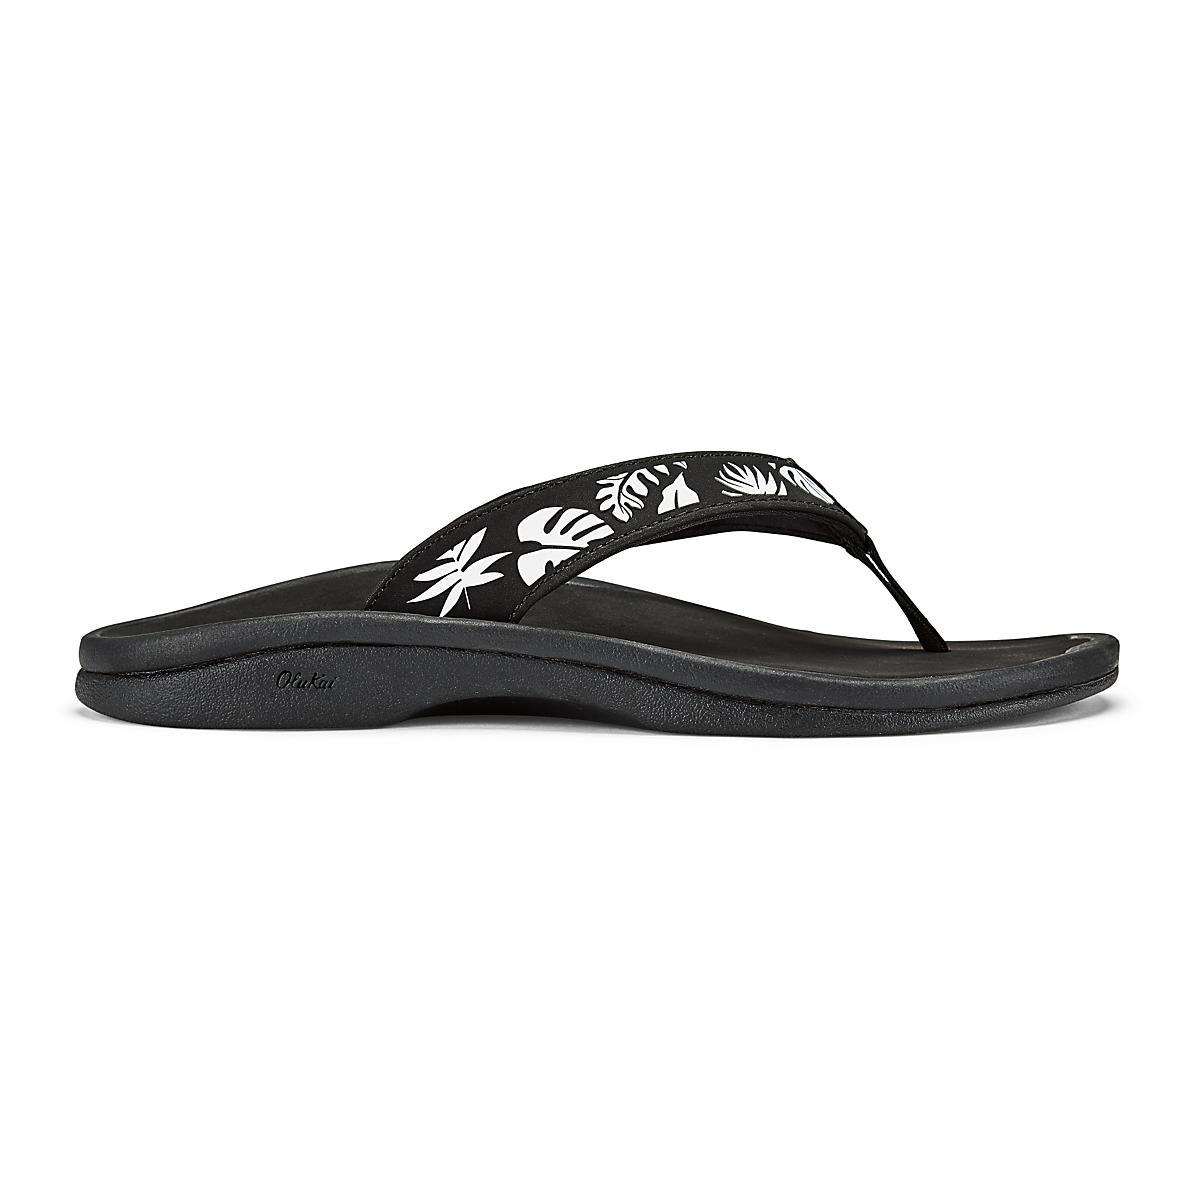 f634021b3d Womens OluKai Ohana Sandals Shoe at Road Runner Sports